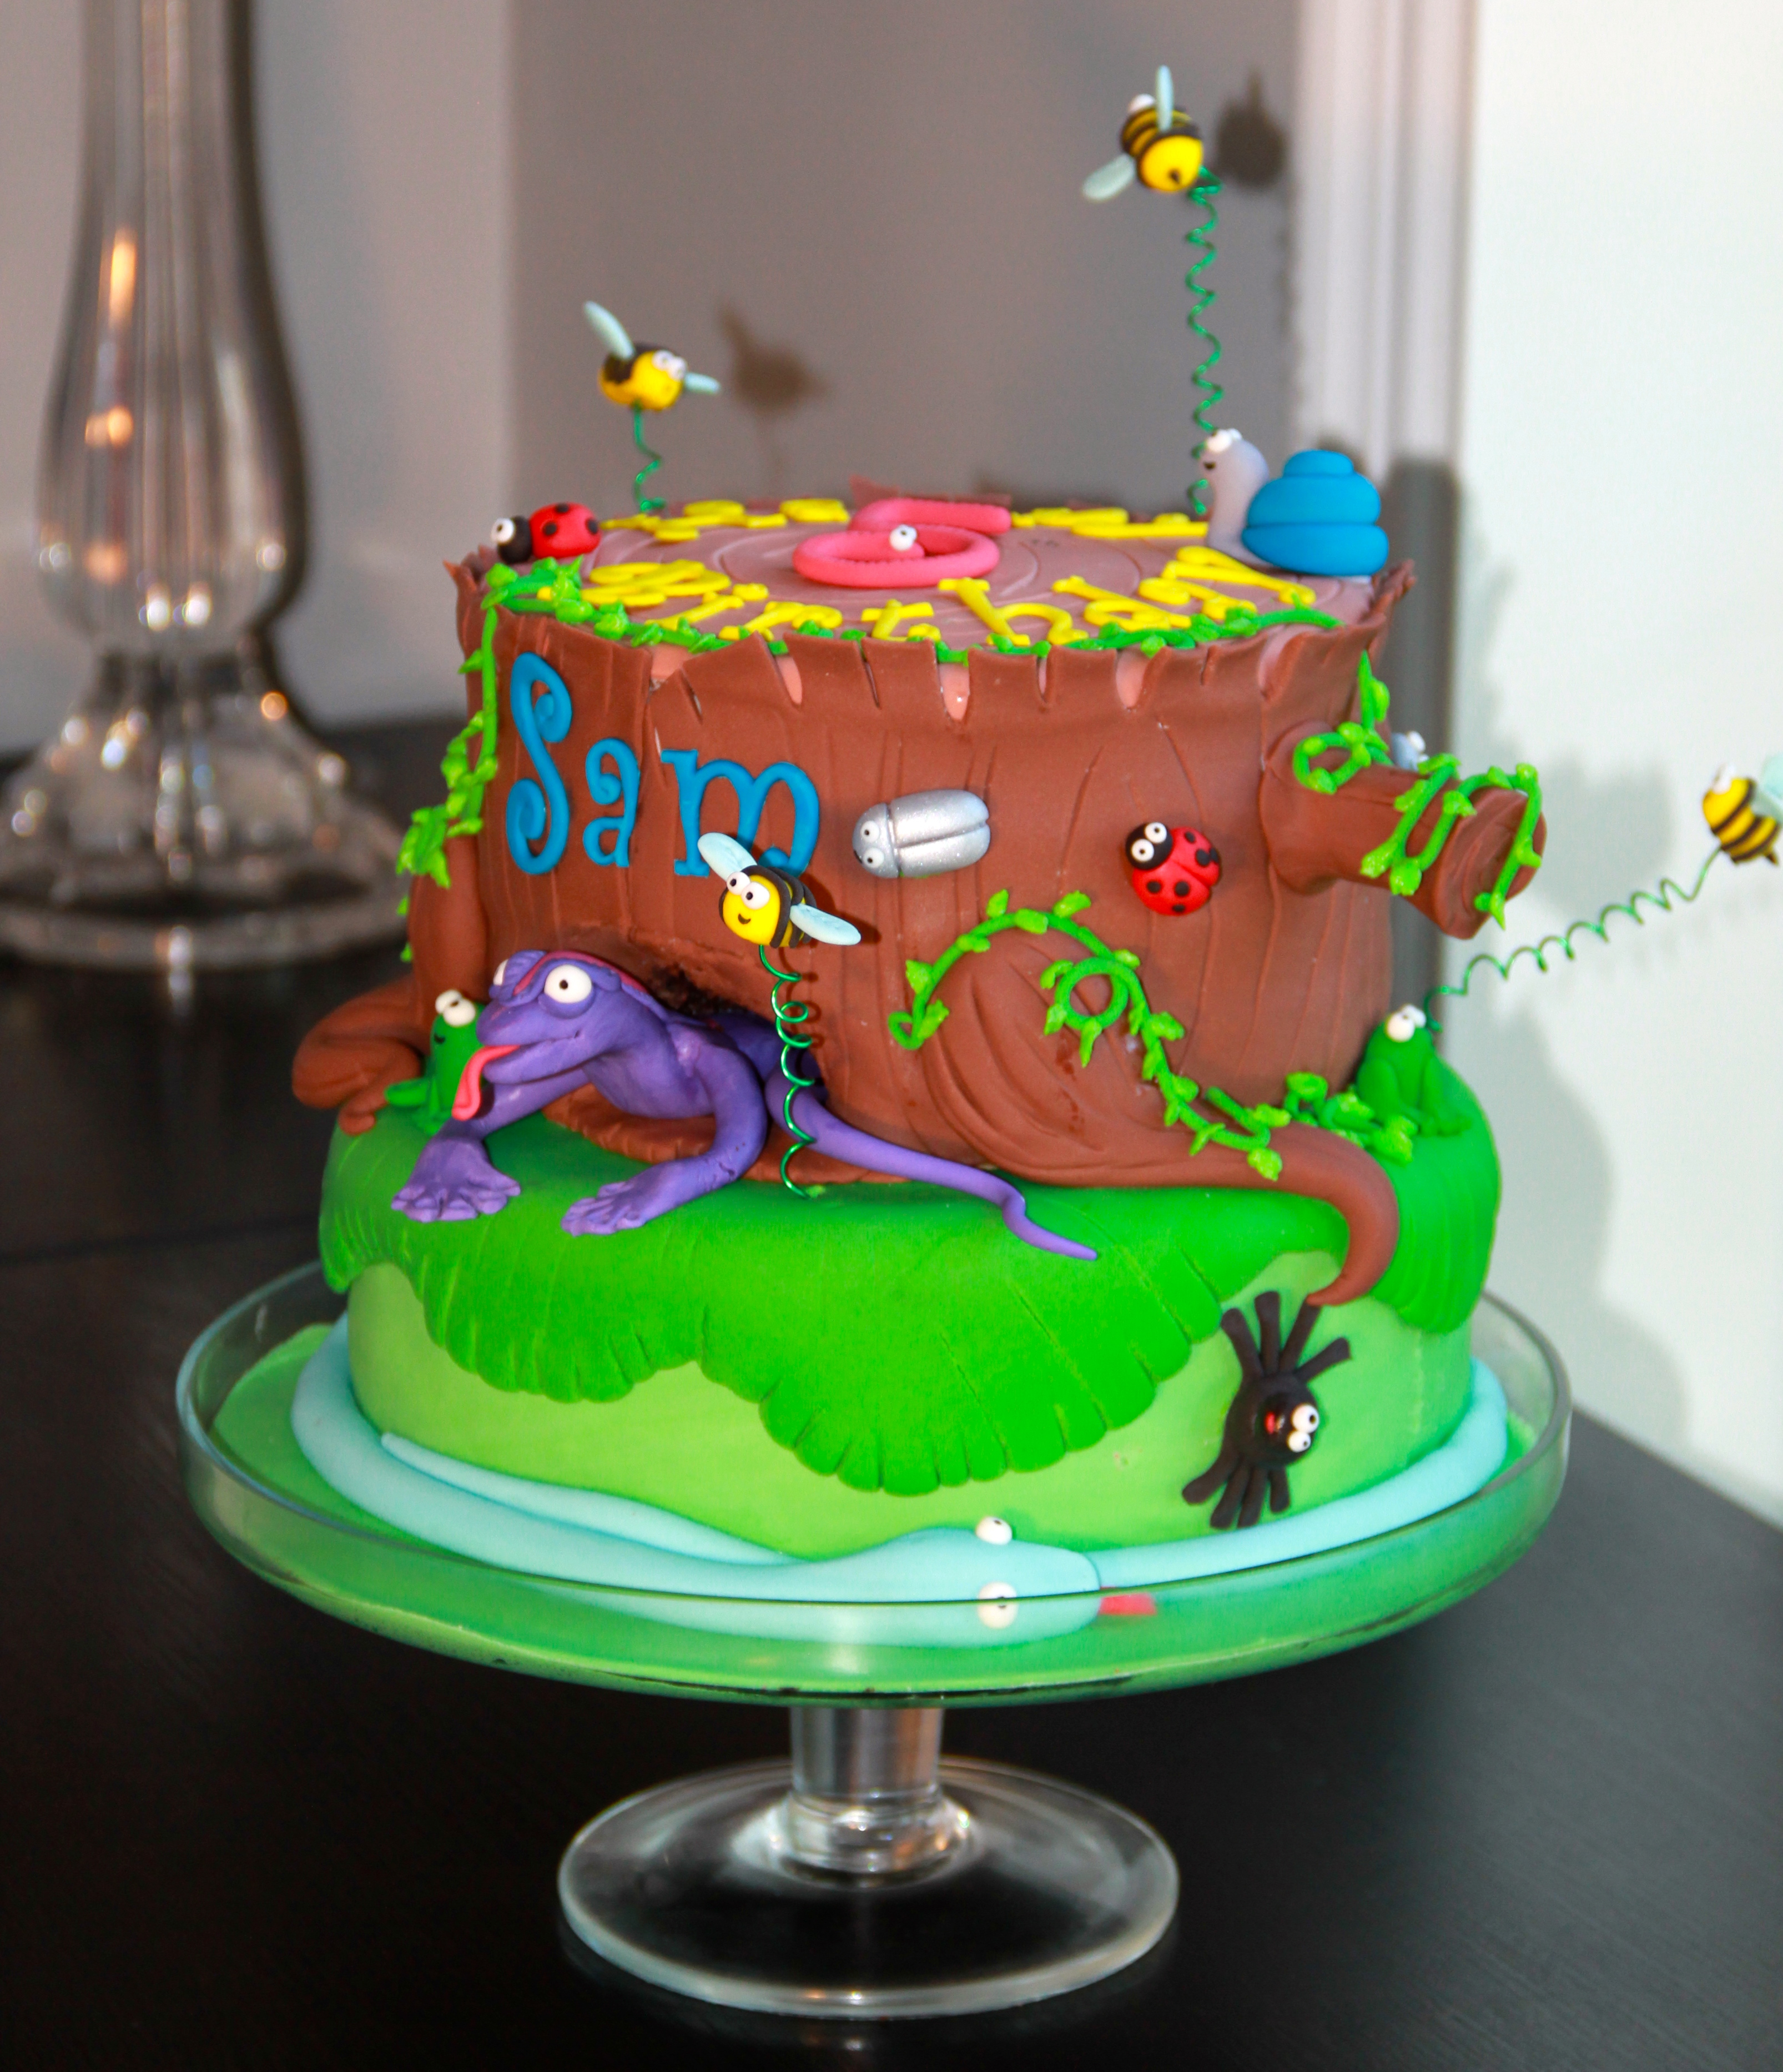 tres leches cake pig cake cake in a mug creepy crawly cake for my son ...